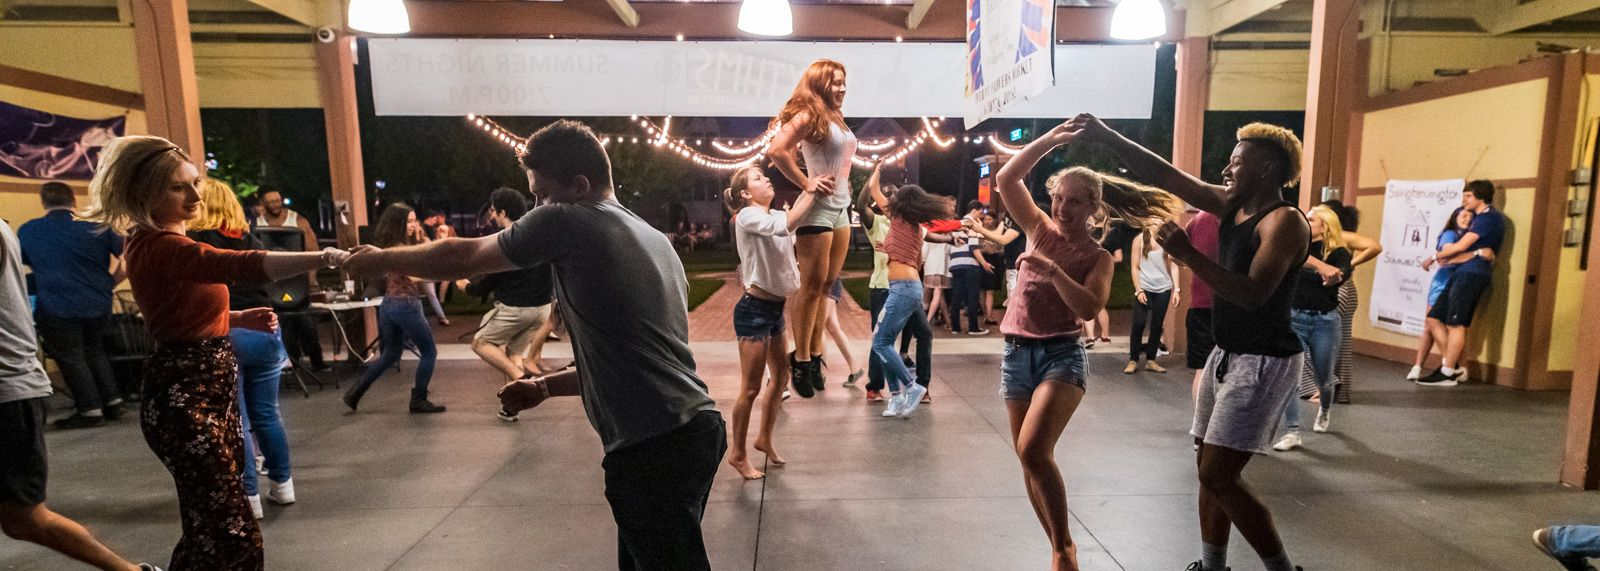 How Downtown Farmington Got Its Swing Farmington Swing Dancing Swingers